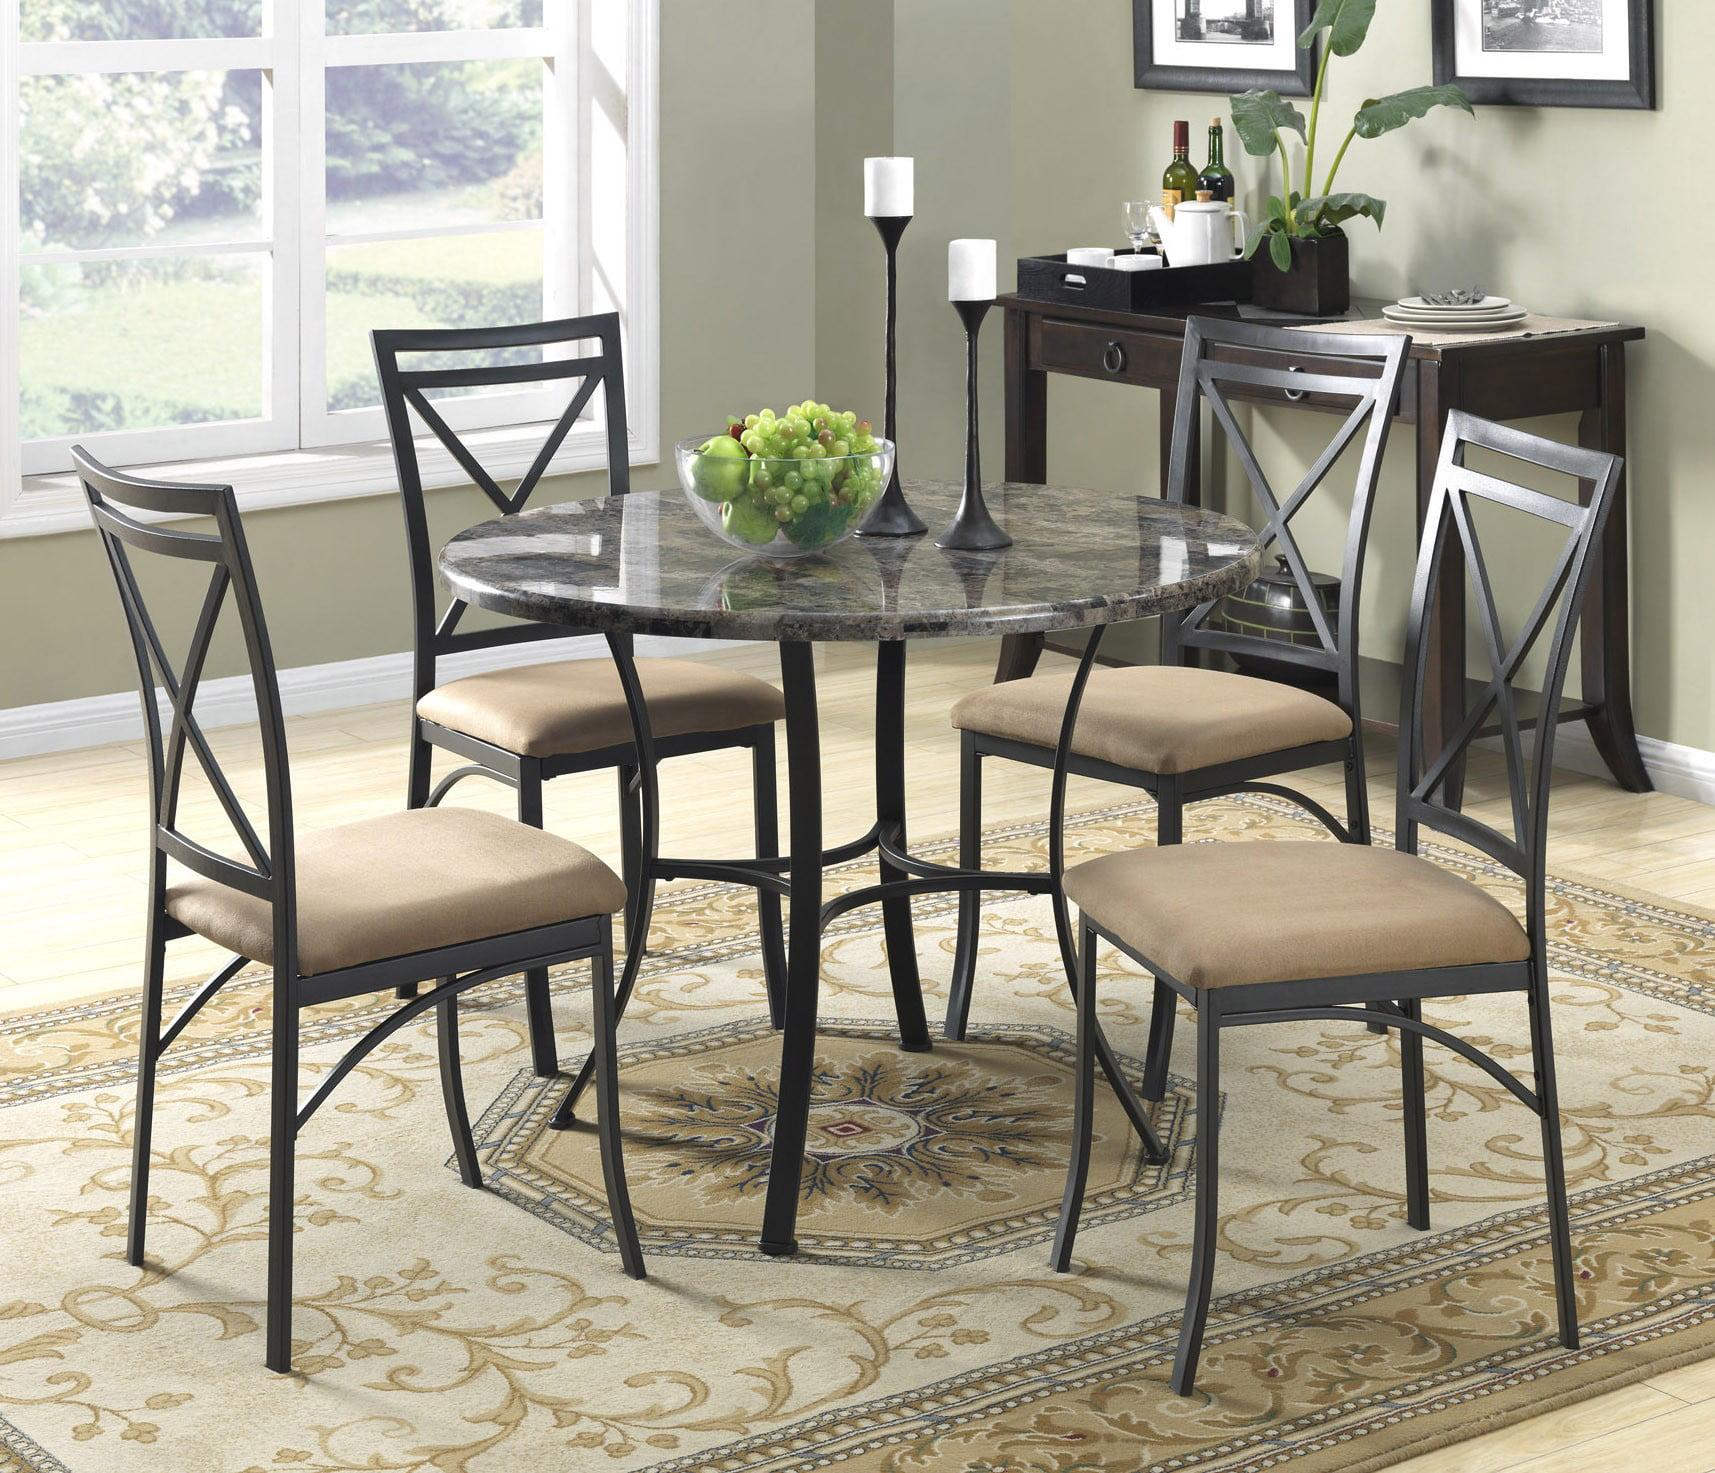 Mainstays 5 Piece Faux Marble Top Dining Set Black Coffee Walmart Com Walmart Com